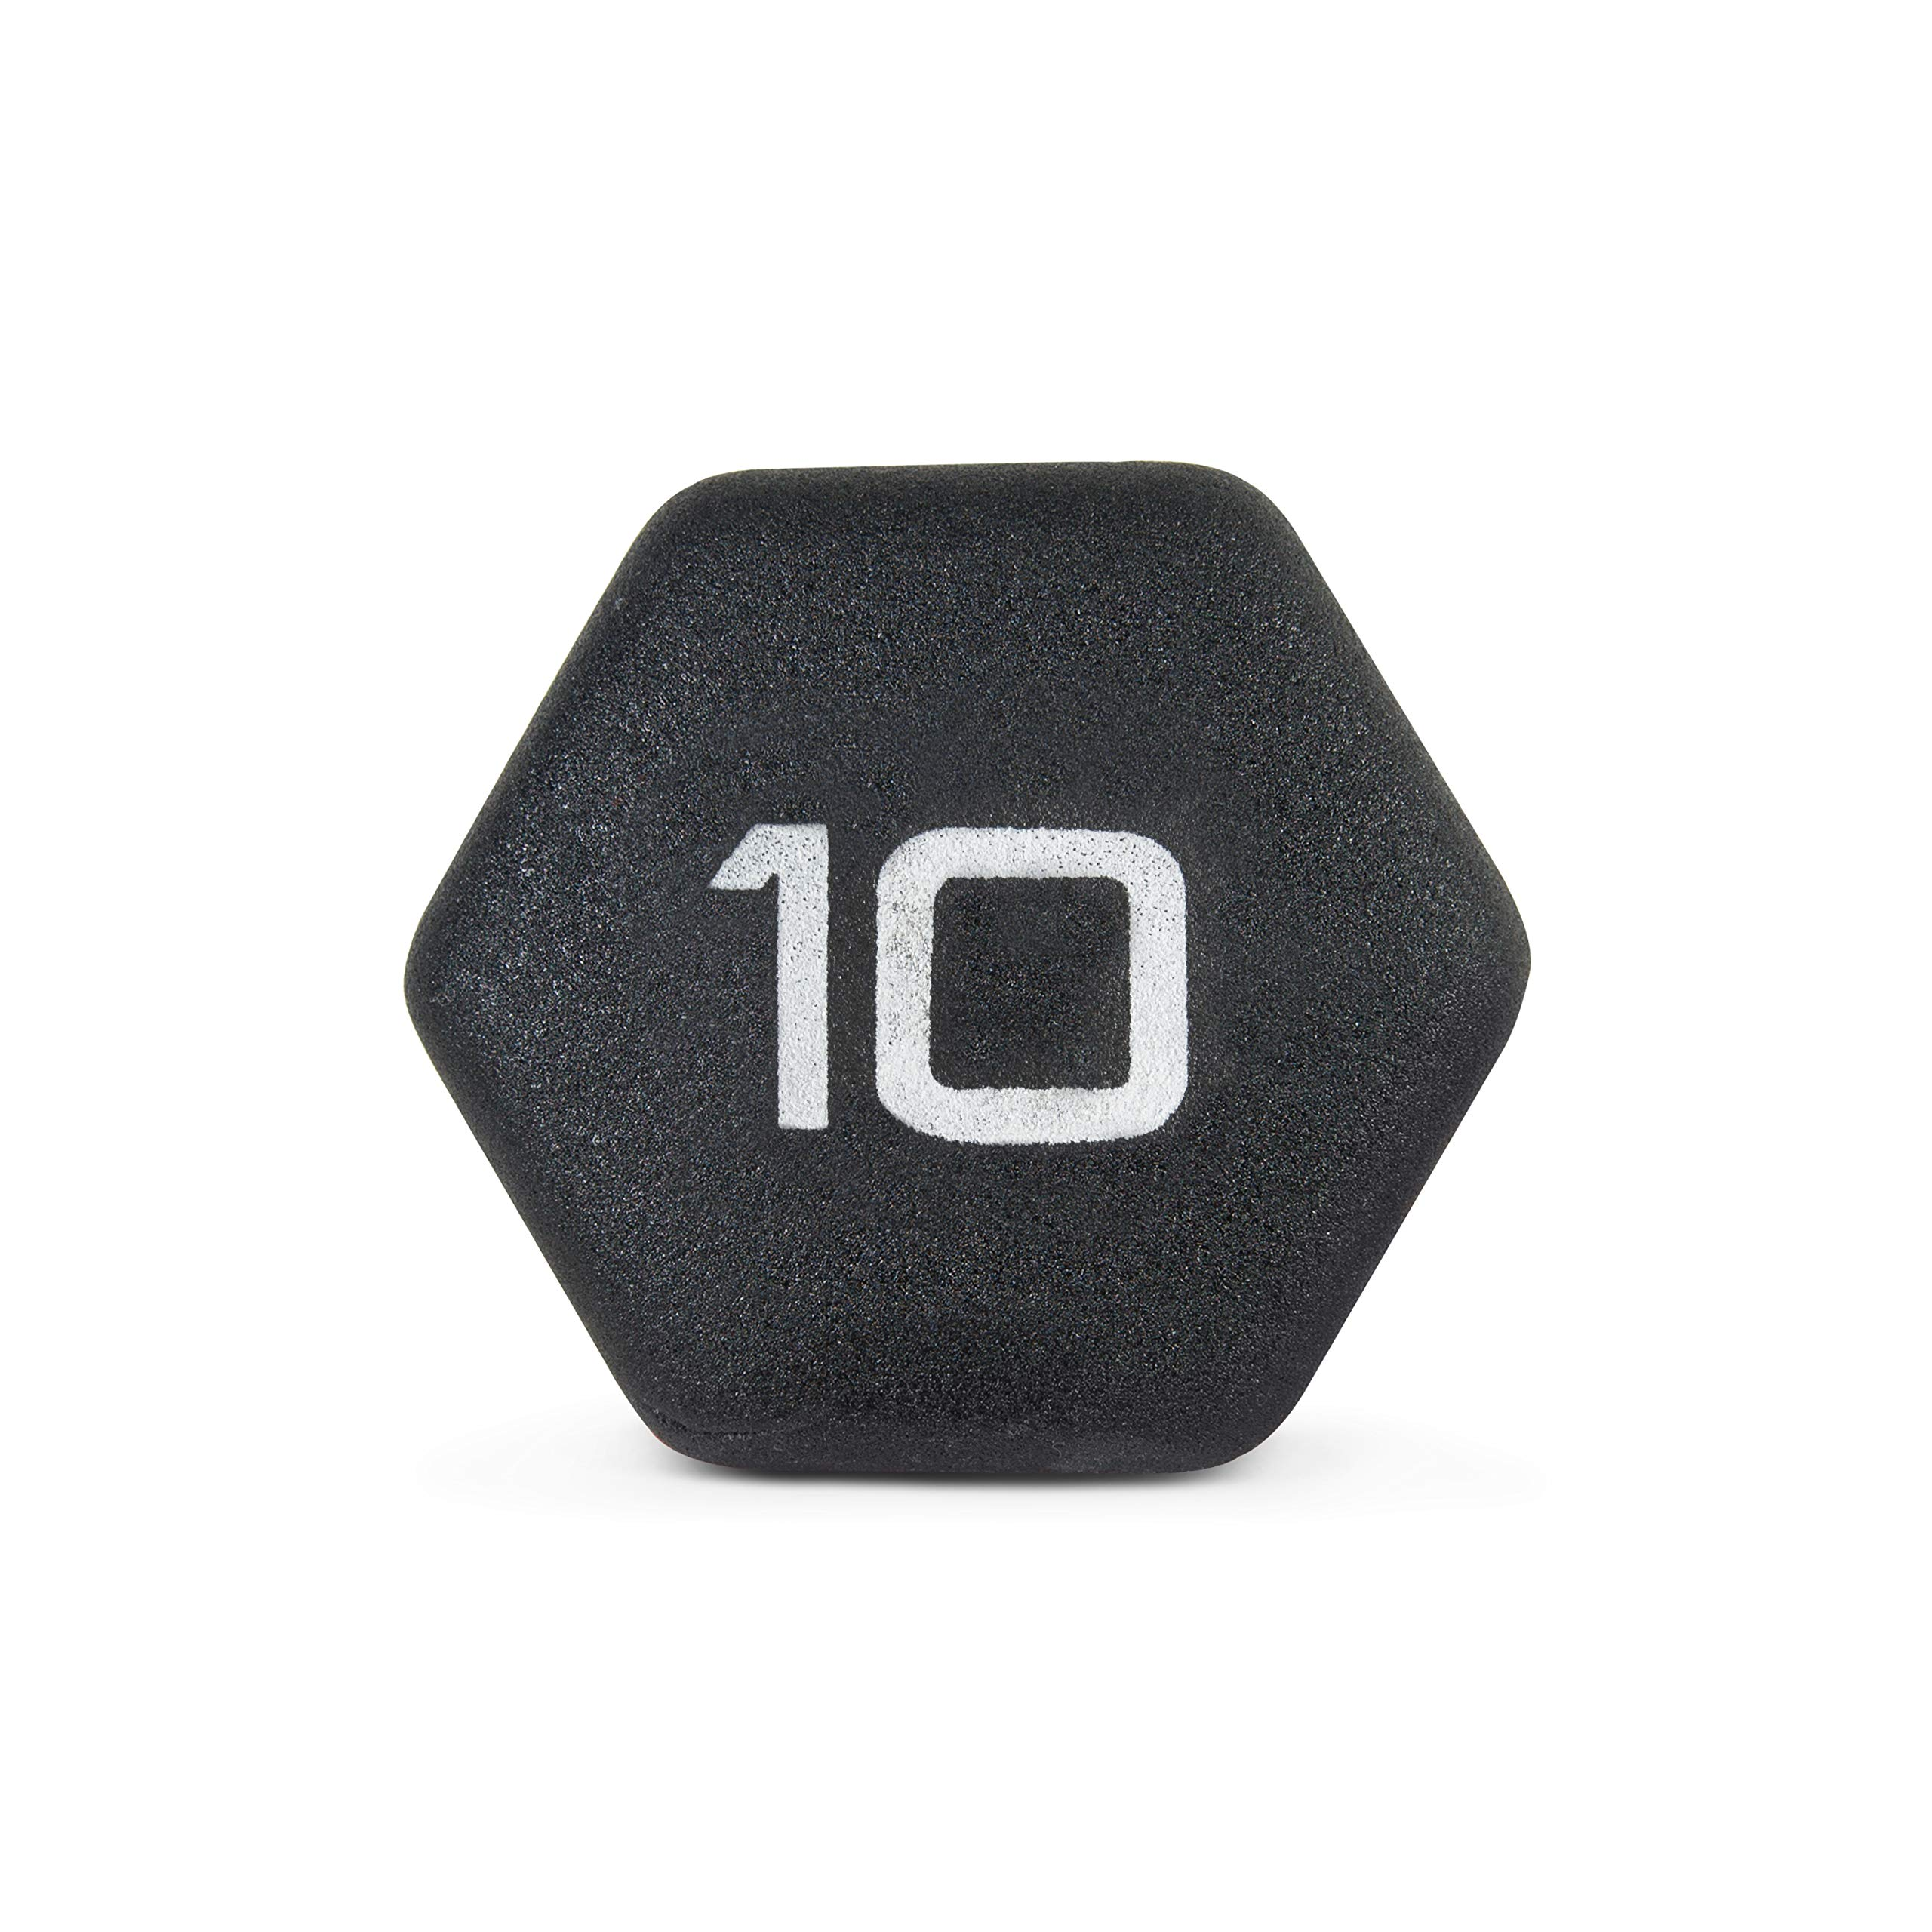 CAP Barbell Neoprene Coated Single Dumbbell, Black, 10-Pound by CAP Barbell (Image #6)